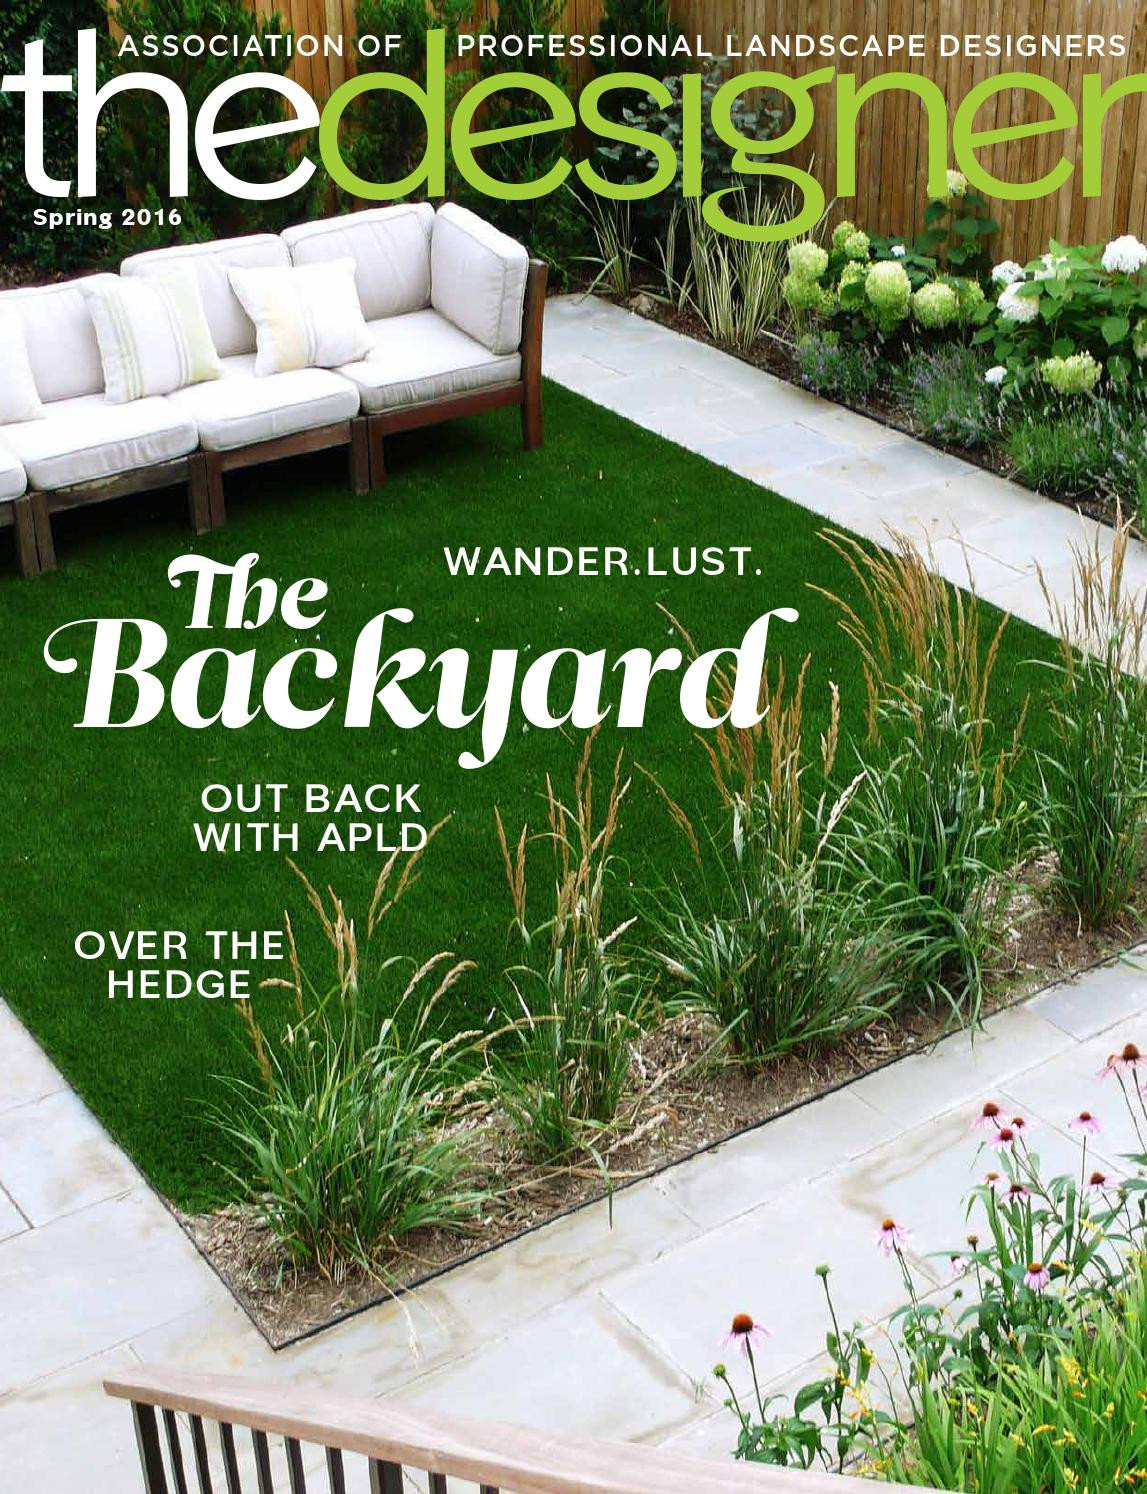 Association Of Professional Landscape Designers  The Designer – Spring 2016 by Association of Professional